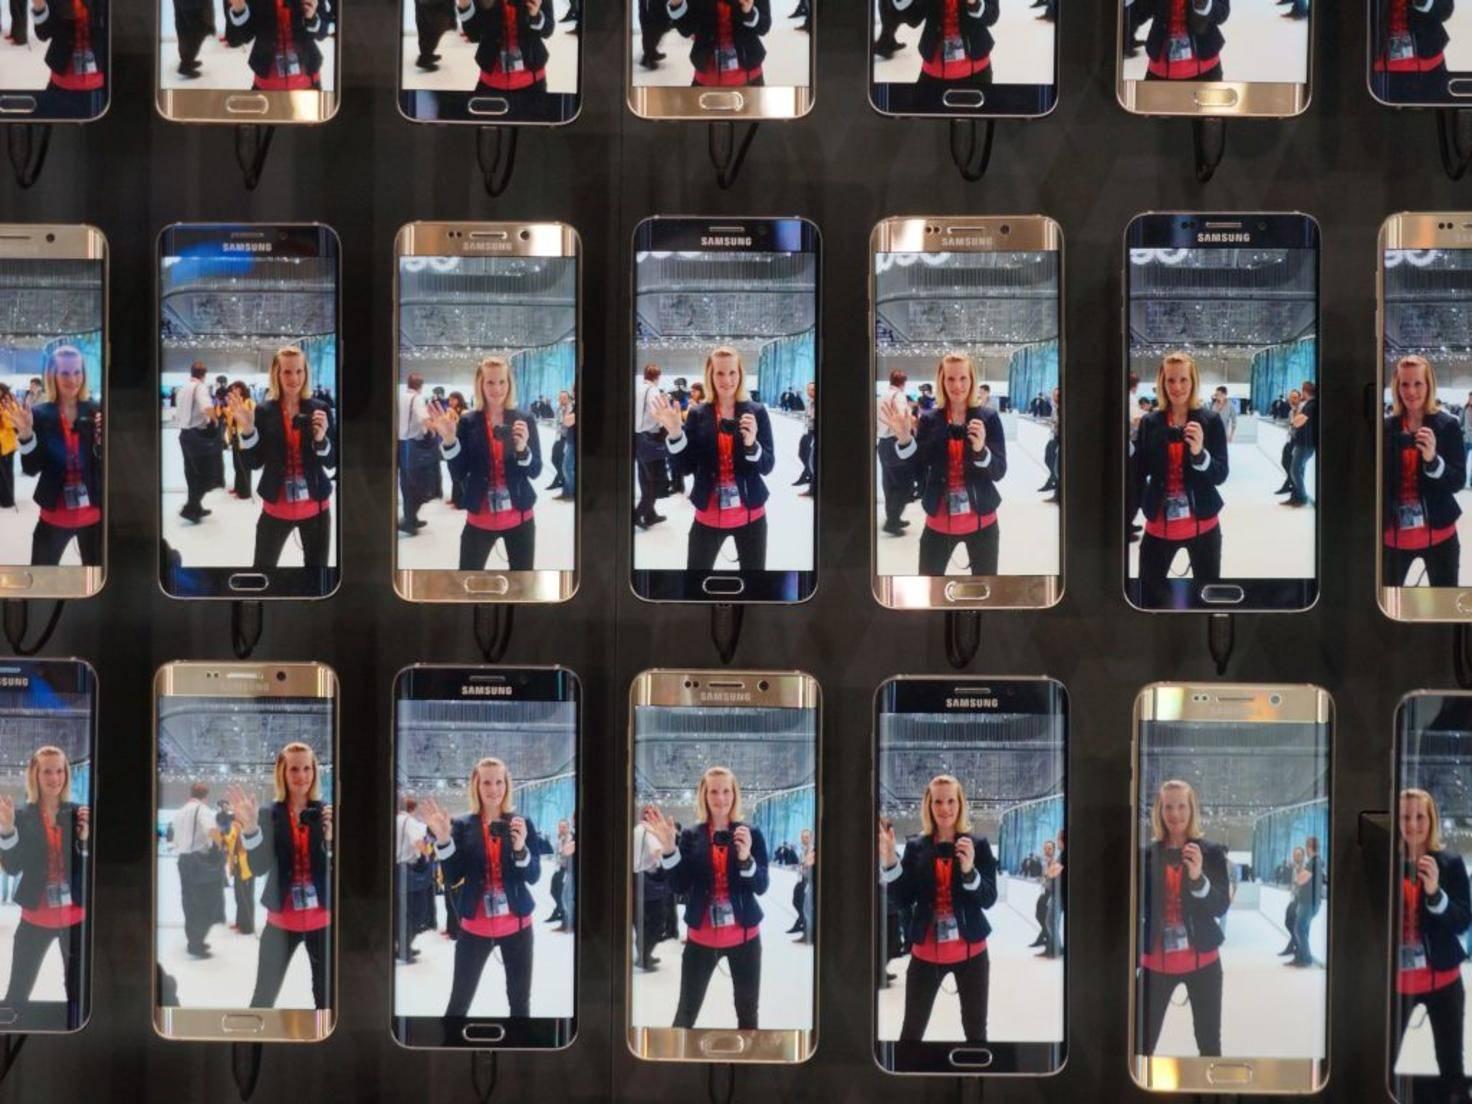 Samsung Galaxy S6 Edge+ 2